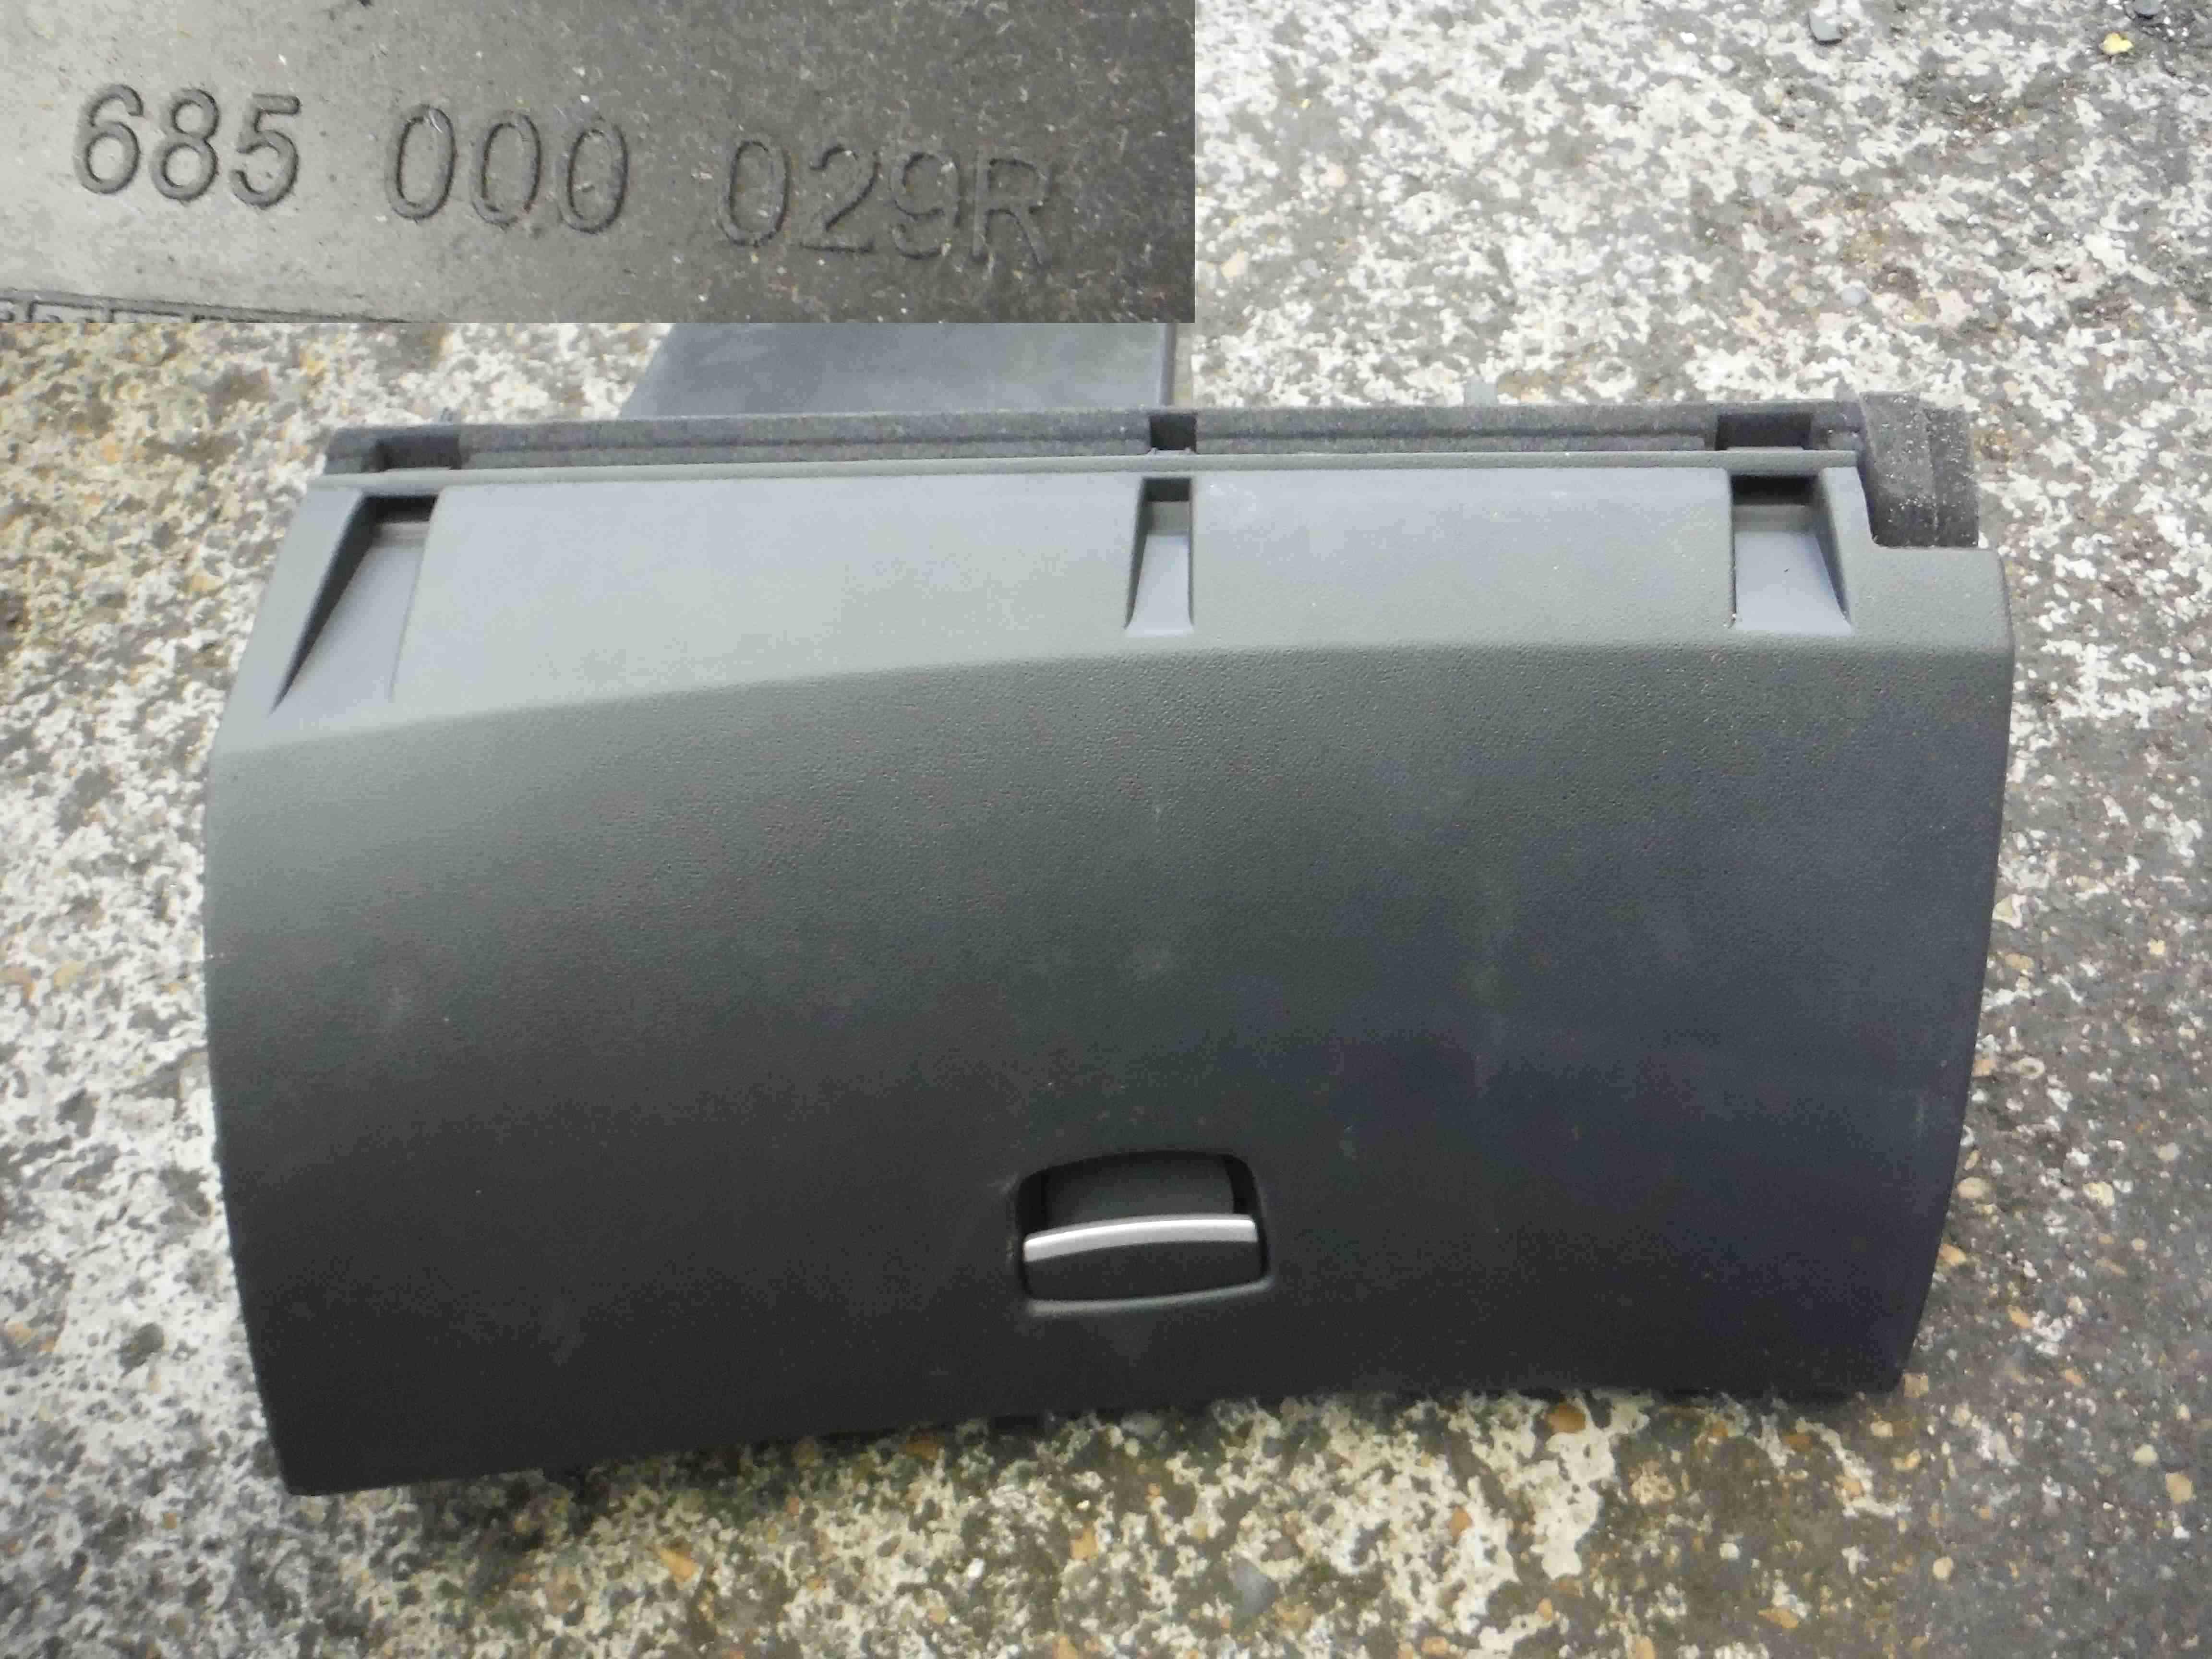 Renault Laguna 2007-2010 Dashboard Glove Box Complete 685000029R